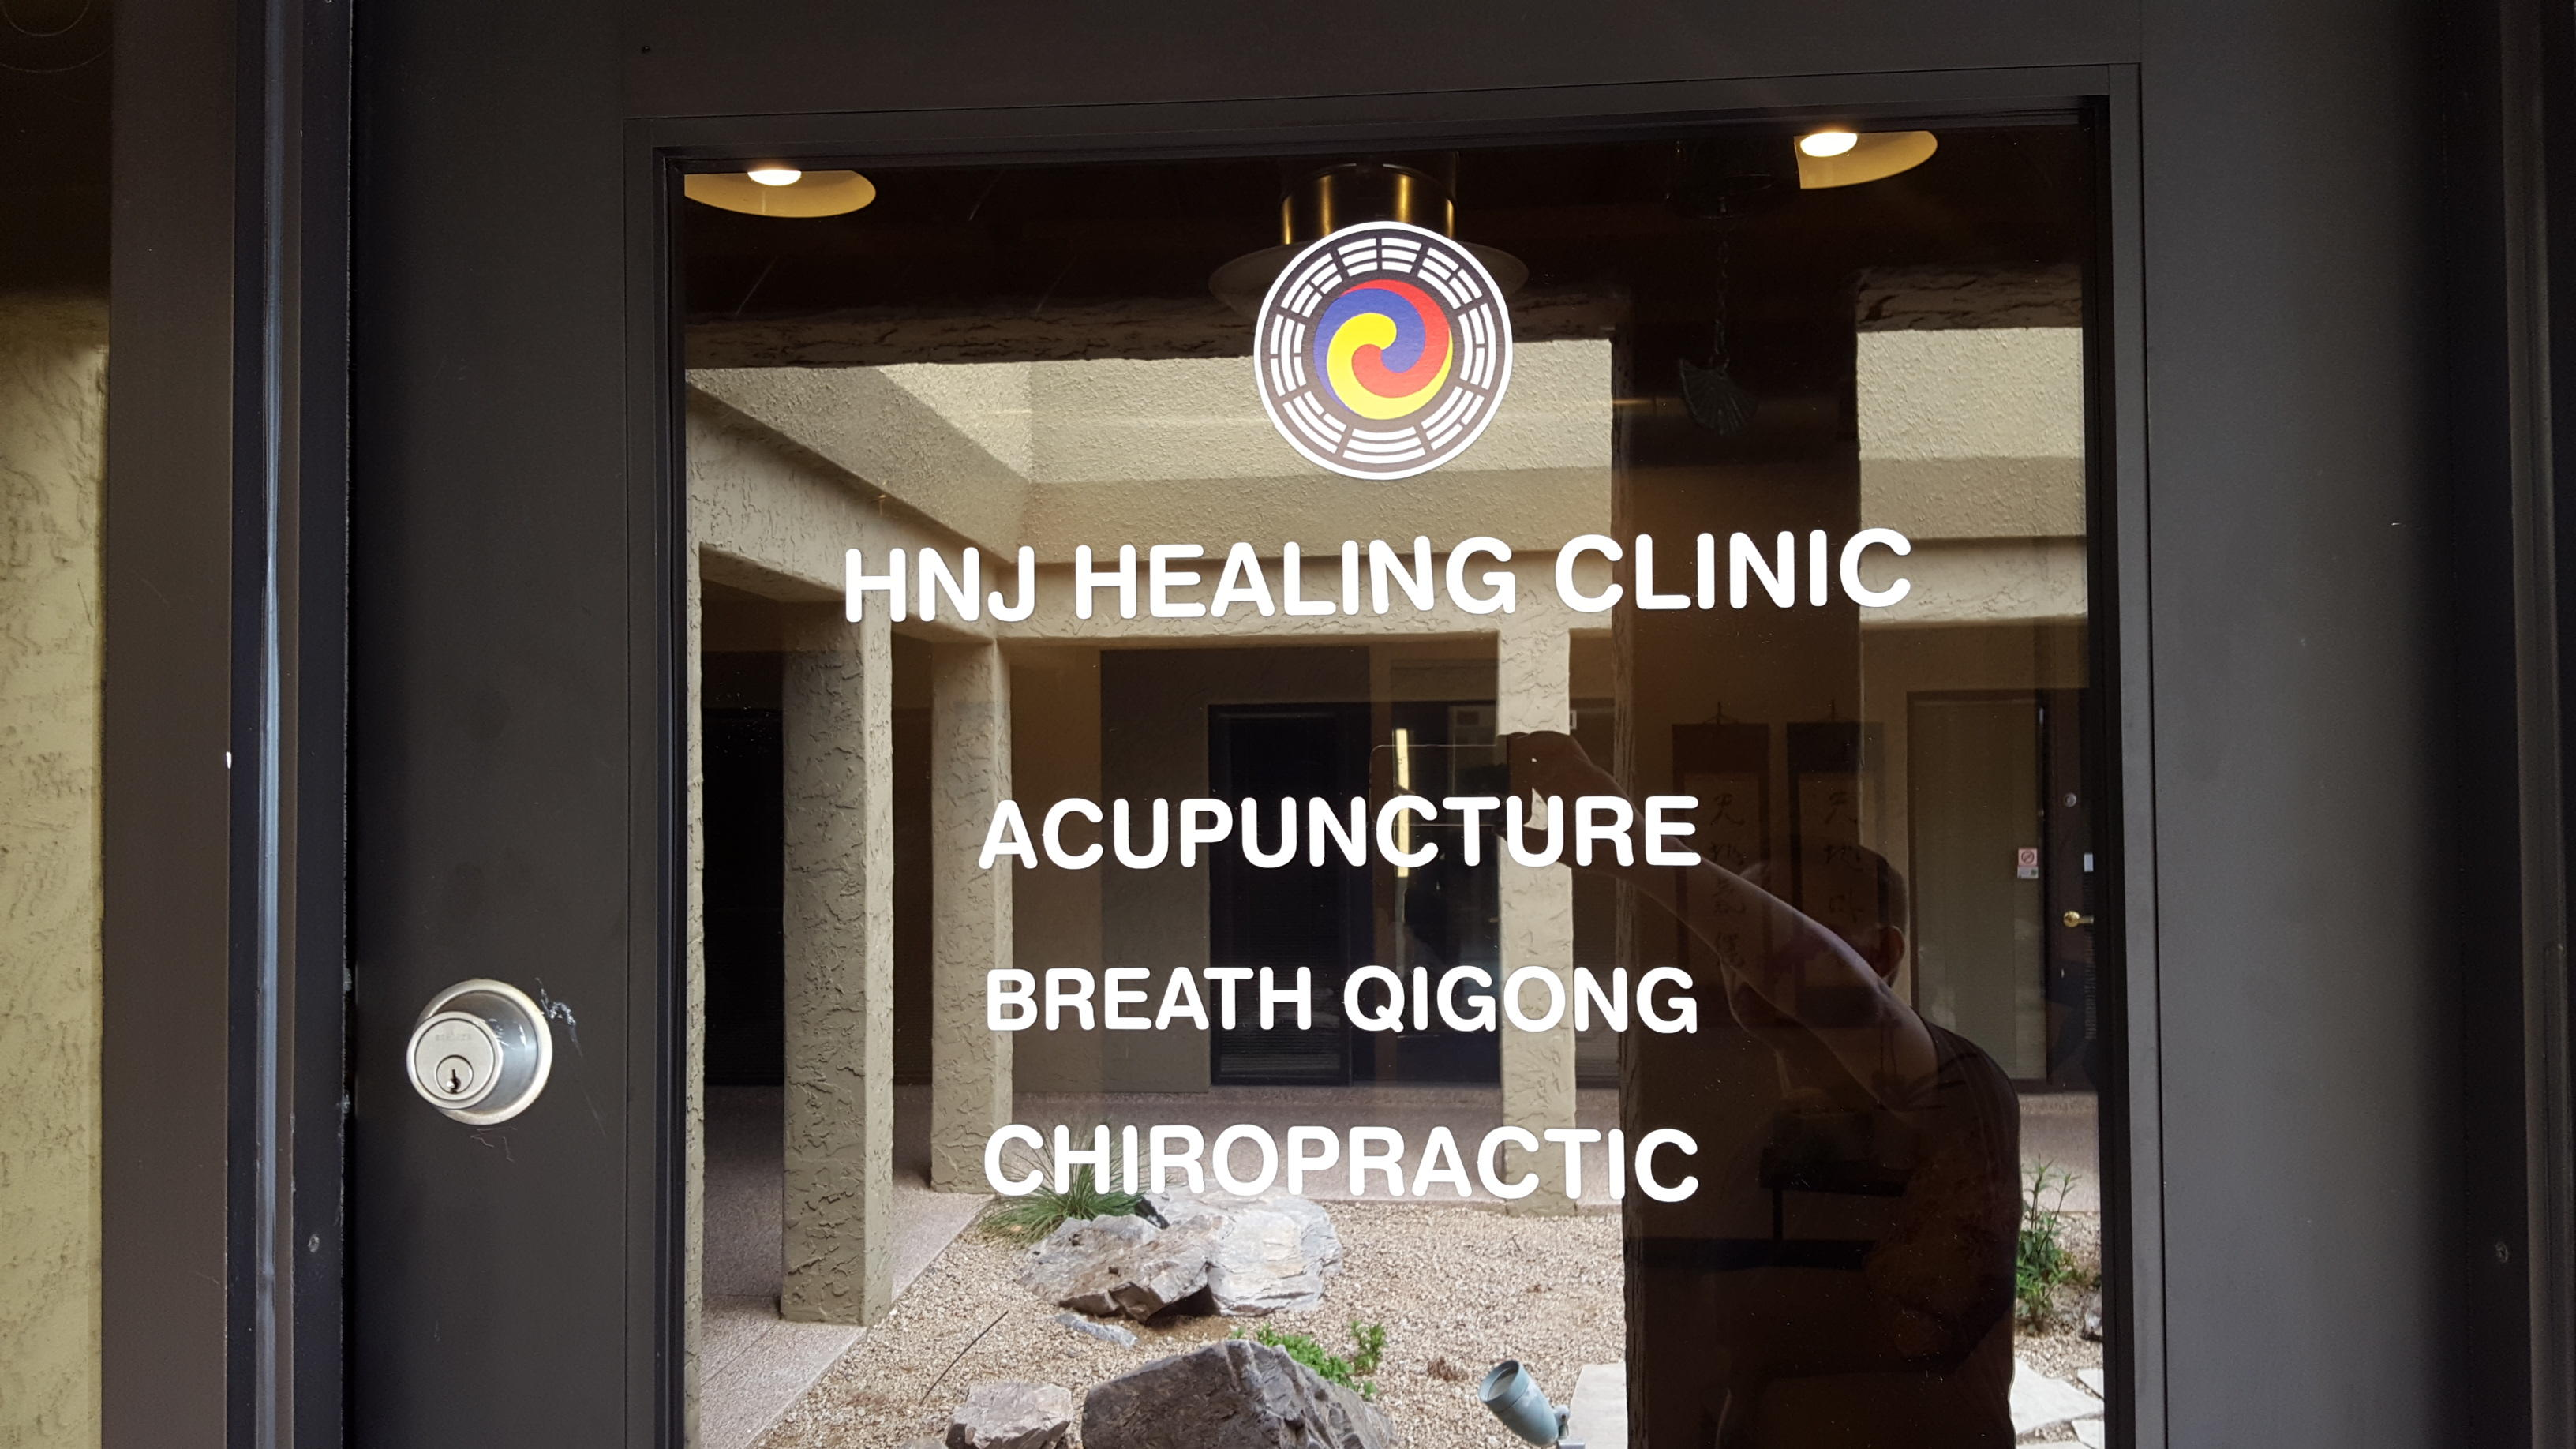 HNJ Healing Clinic image 40